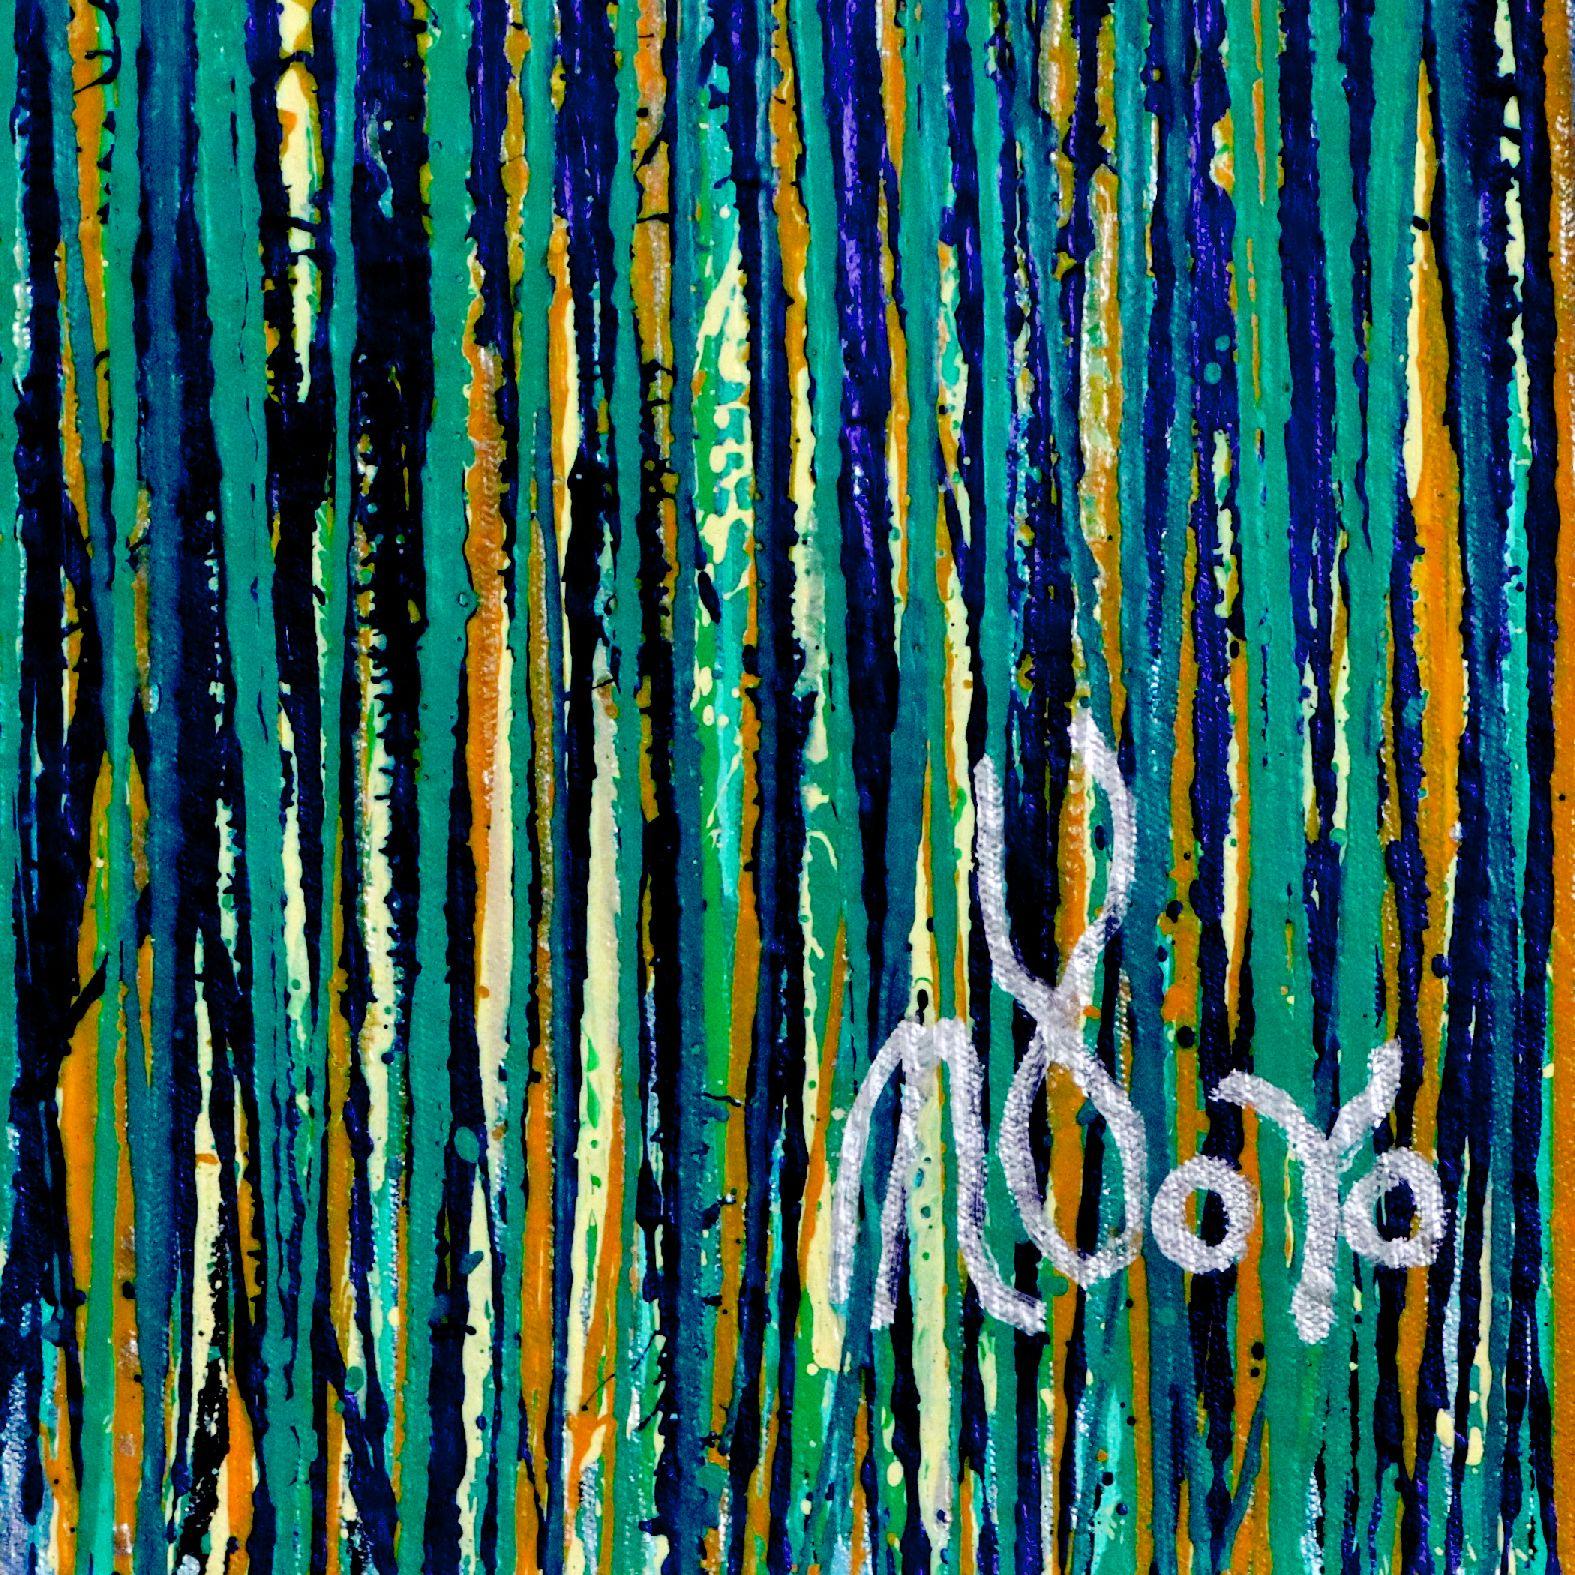 Signature - Shimmer and breeze garden 2 (2020) by Nestor Toro